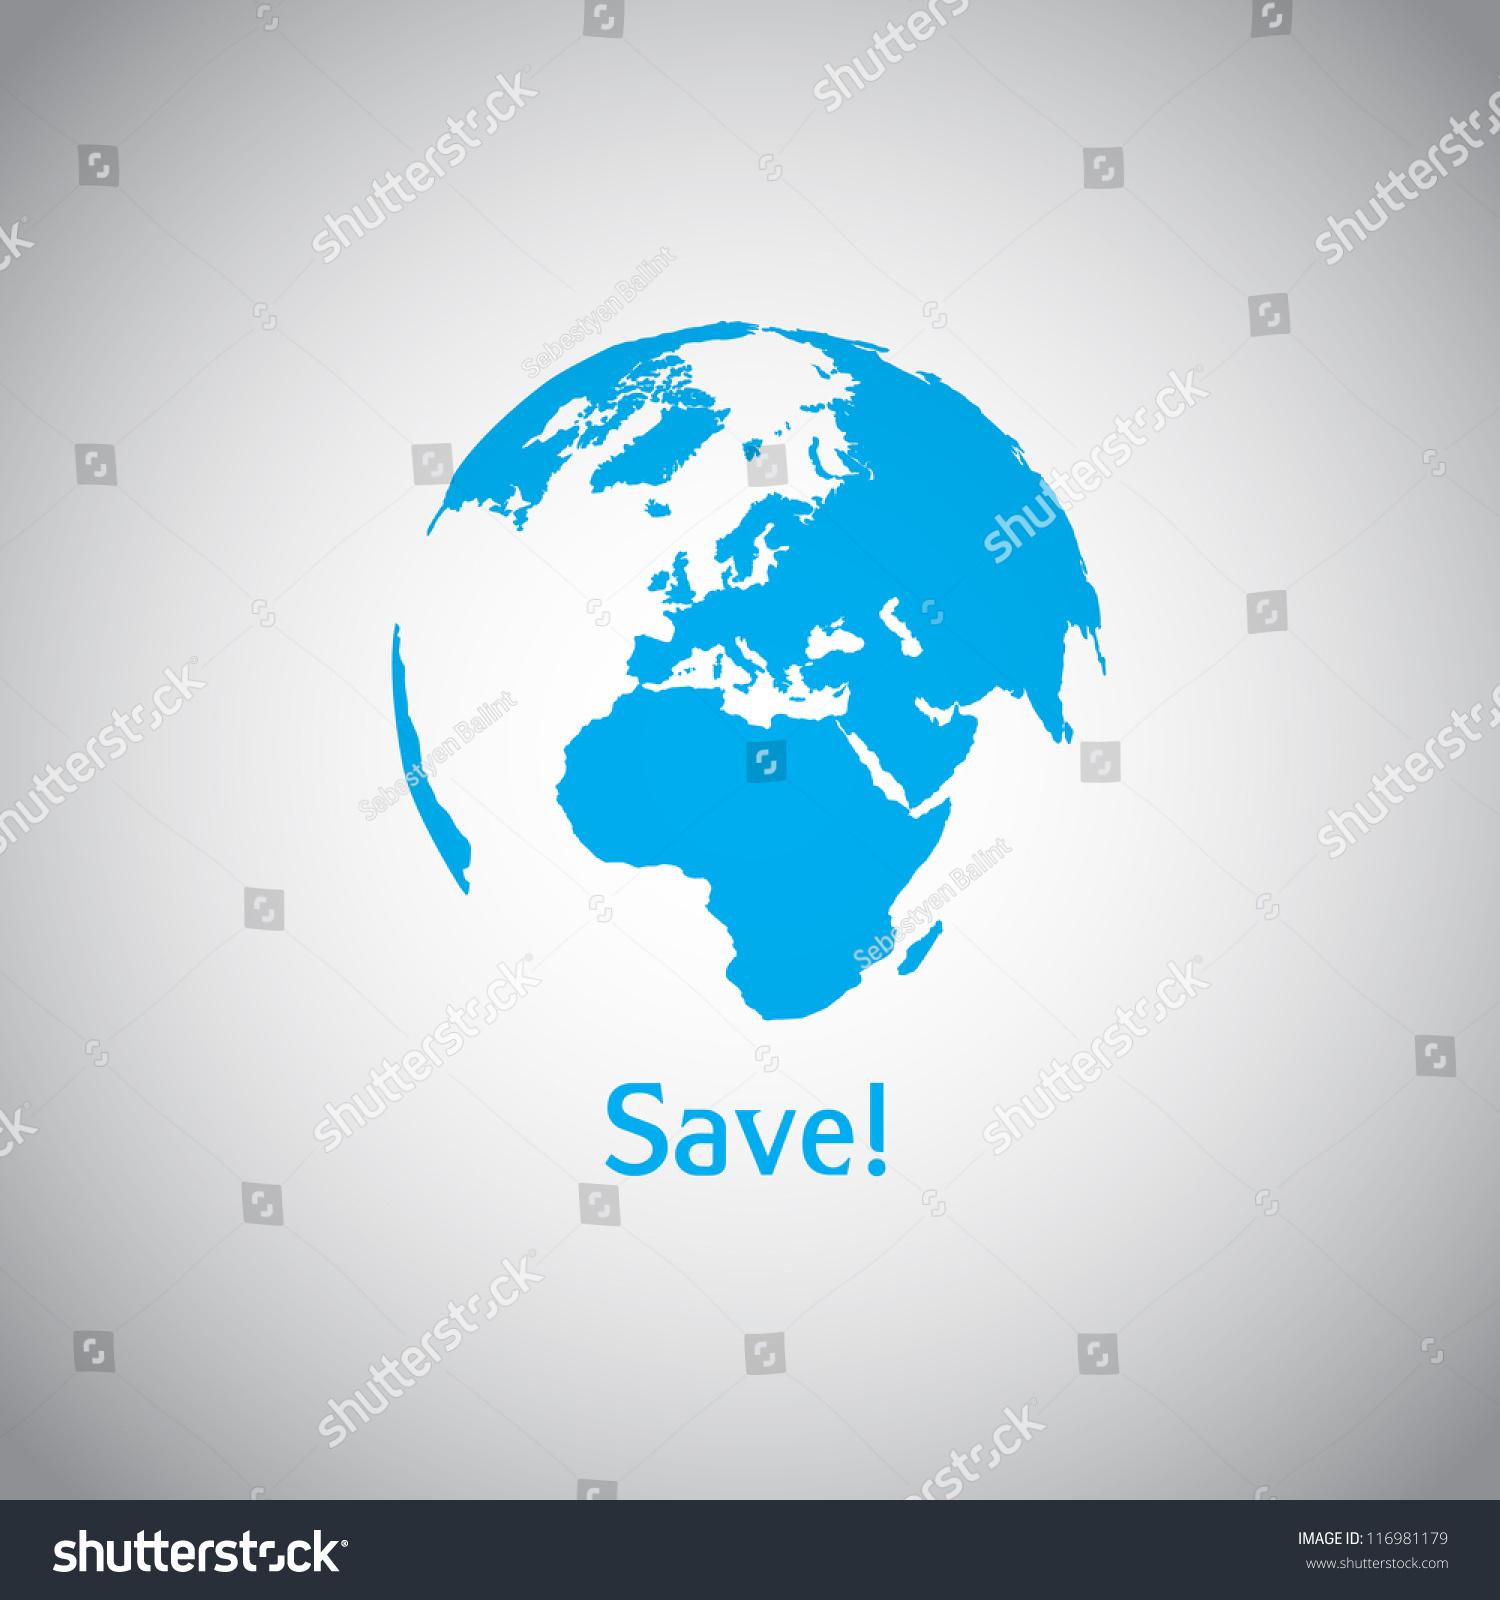 Save World Vector Symbol Stock-Vektorgrafik (Lizenzfrei) 116981179 ...